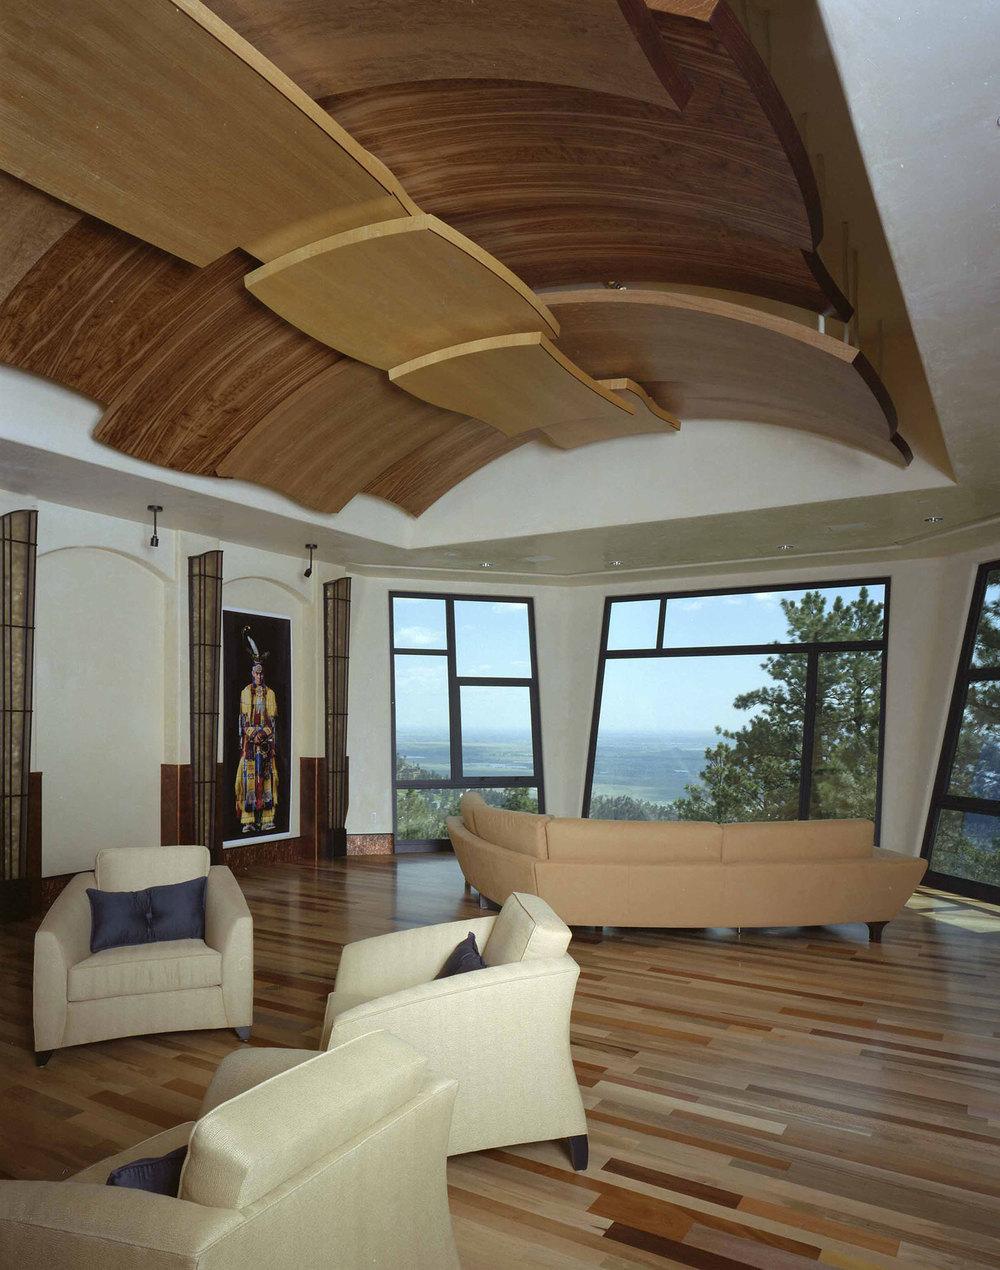 BEST-Interior-Great-Room-South-East.jpg